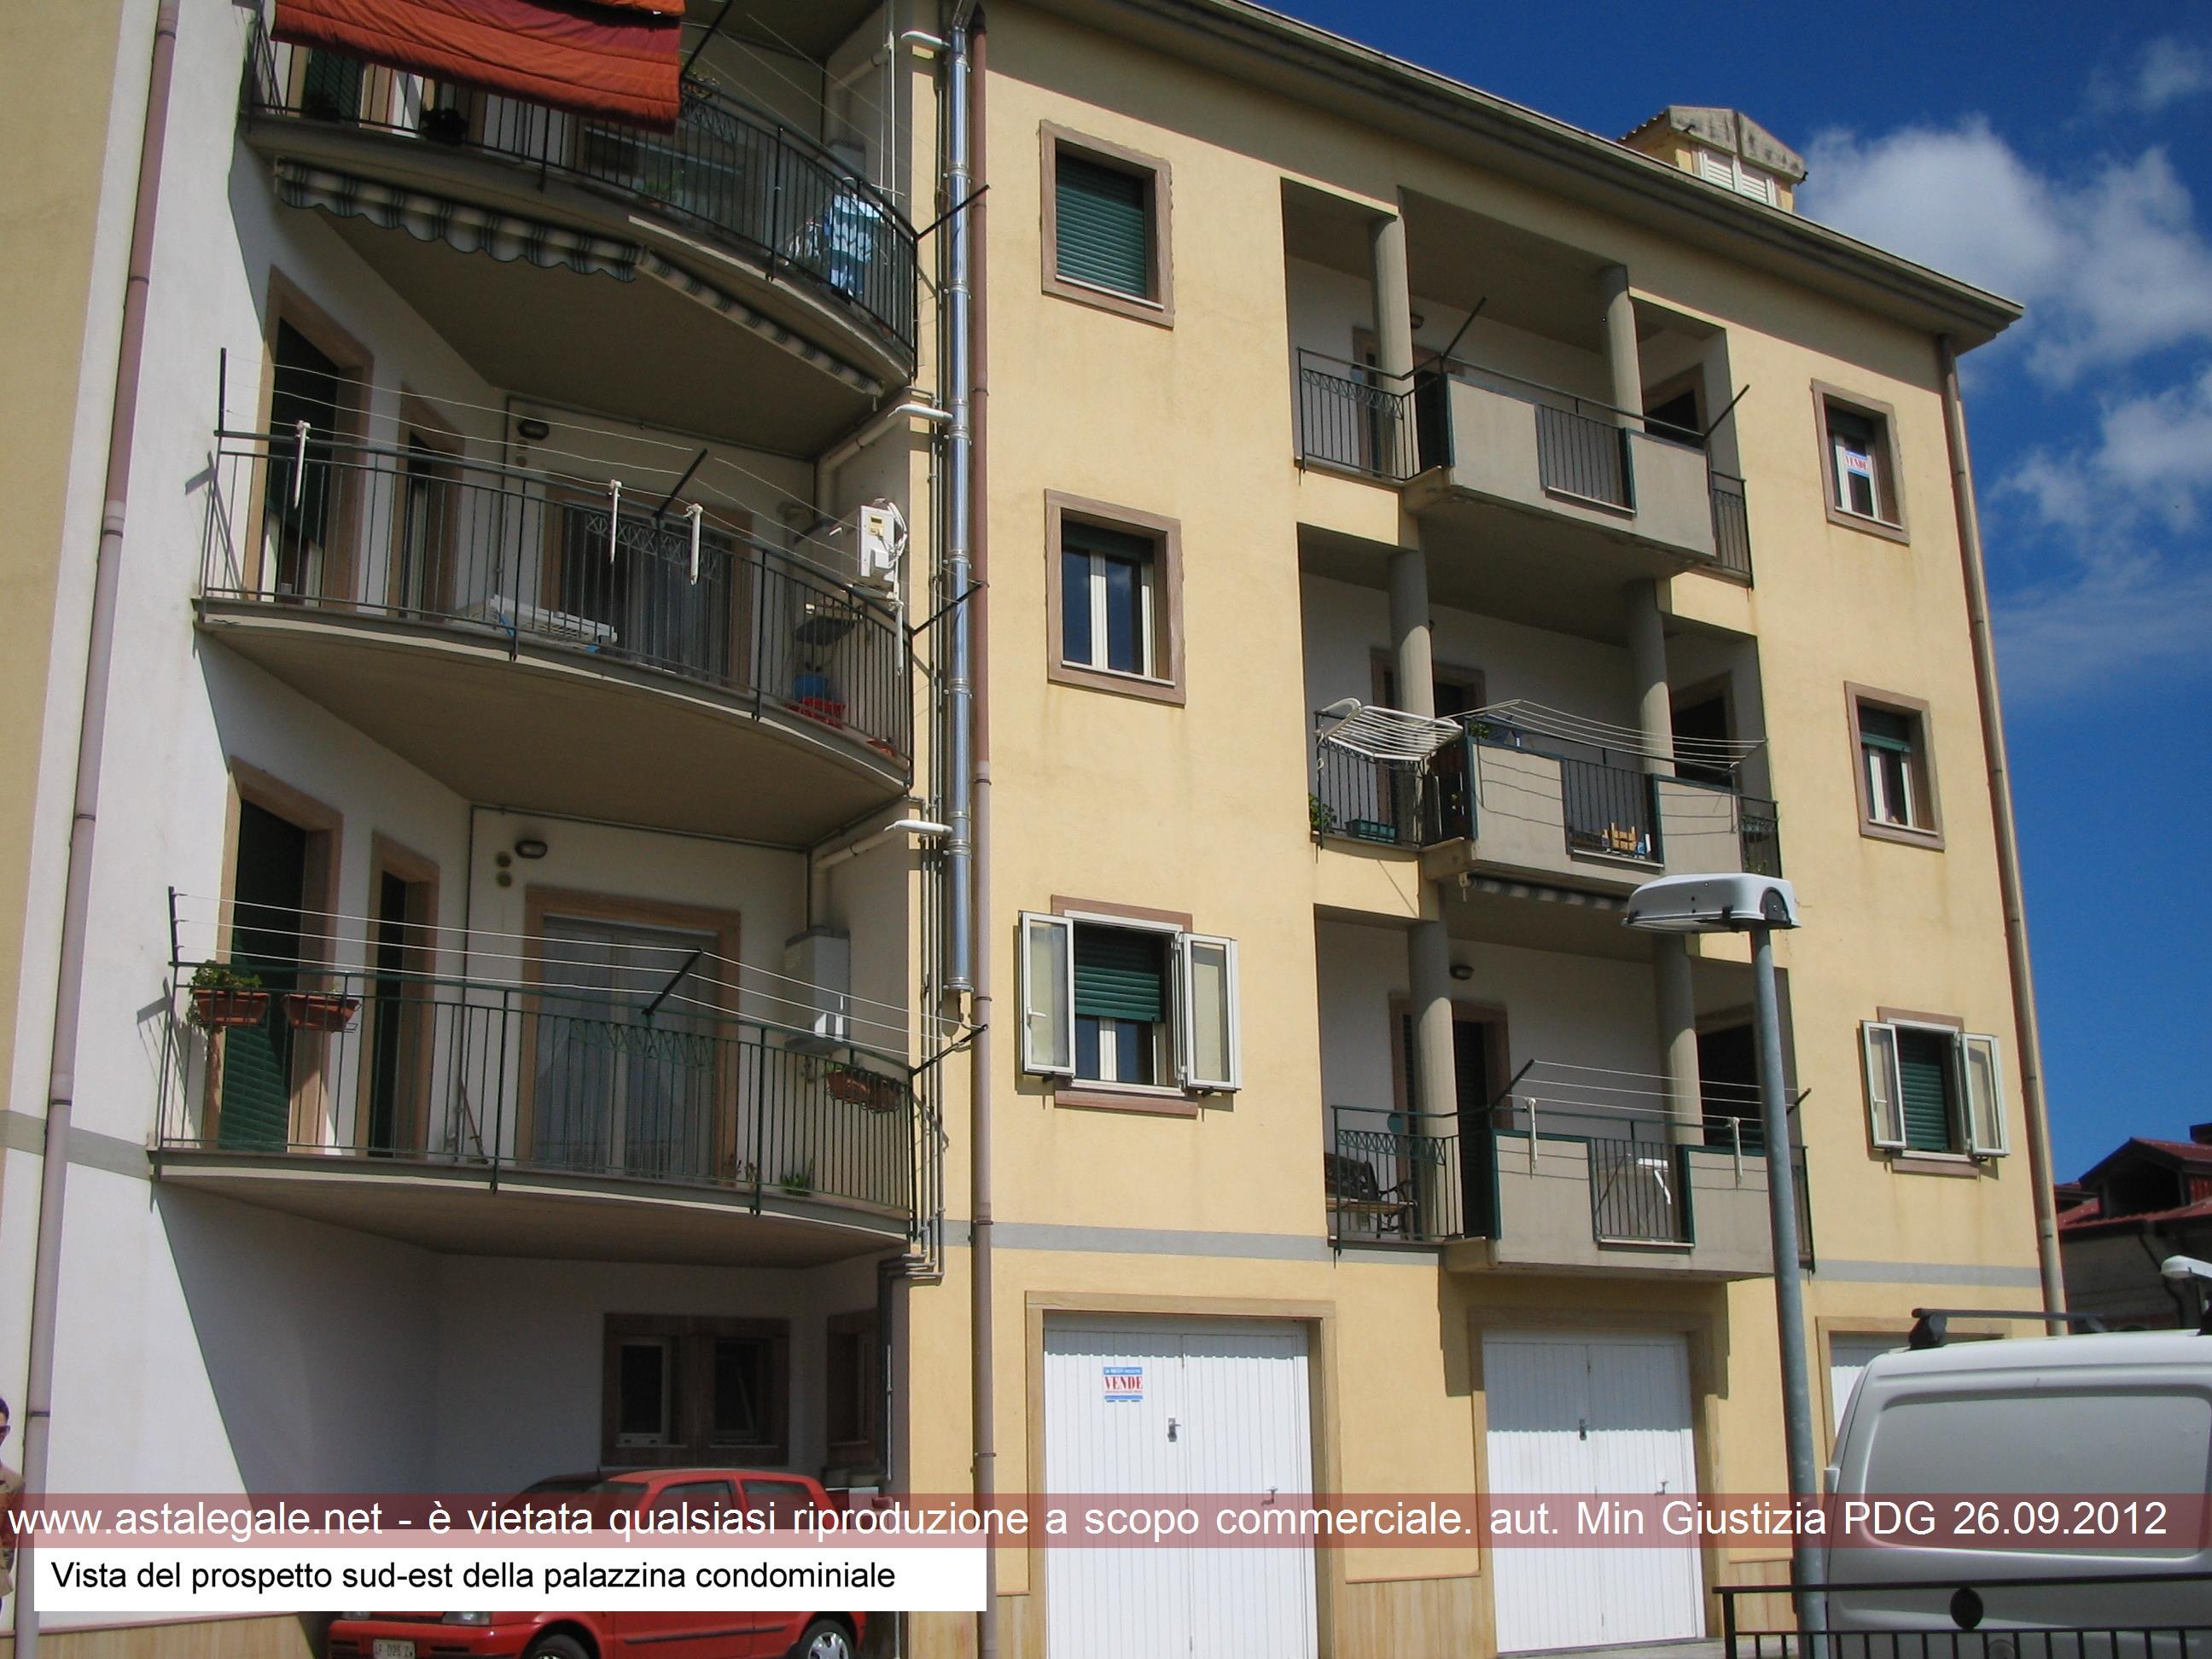 Troina (EN) Via Nazionale 113 e Via Regalbuto 40